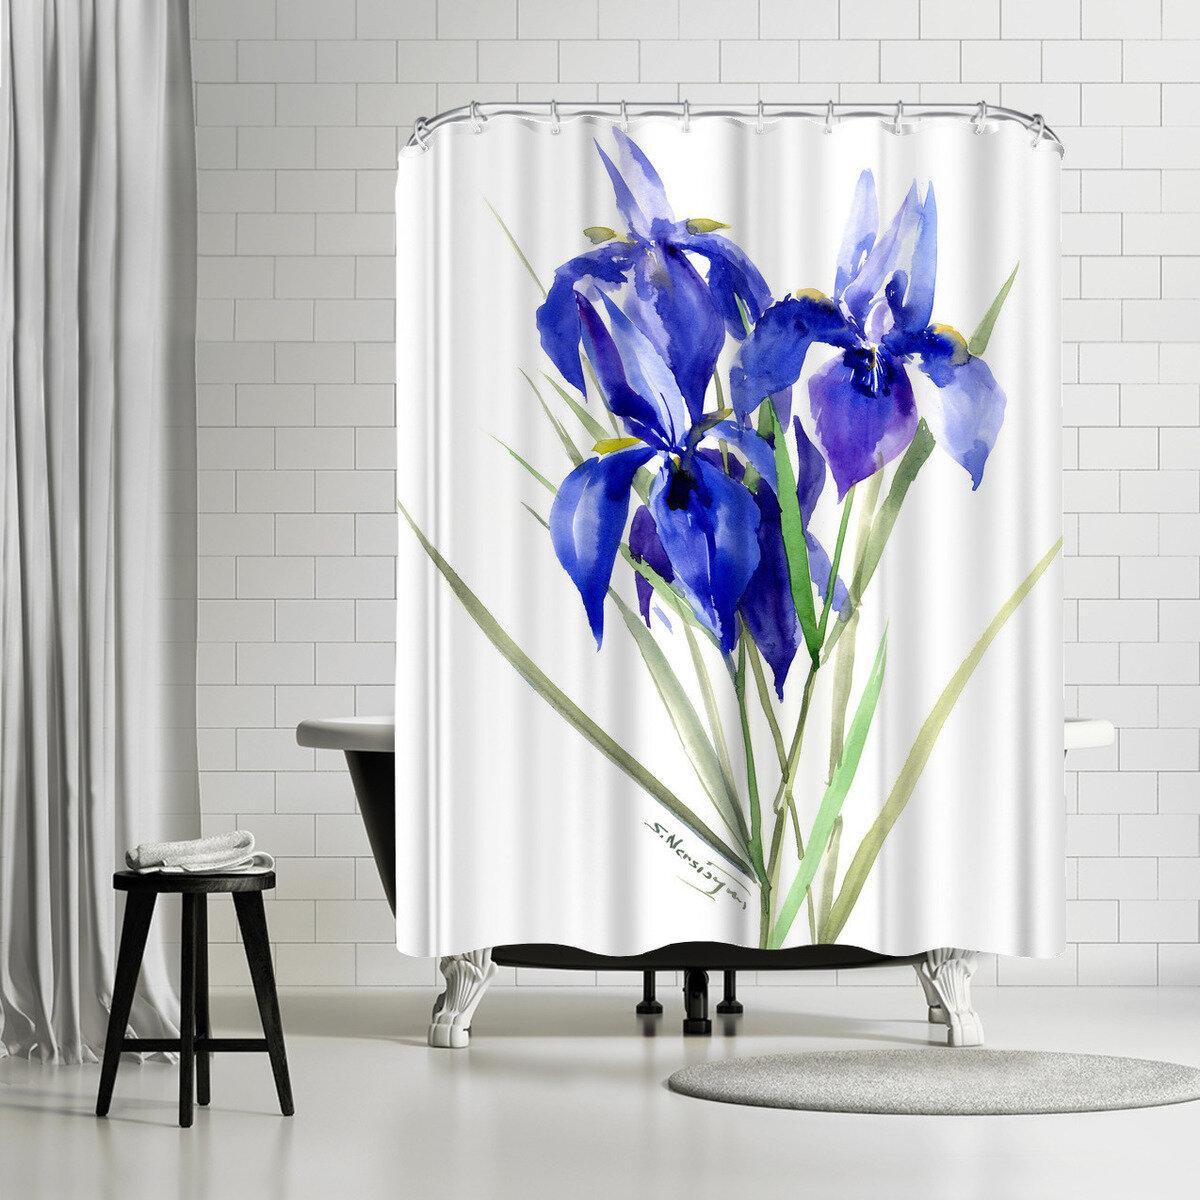 East Urban Home Suren Nersisyan Iris Flowers 3 Single Shower Curtain Wayfair